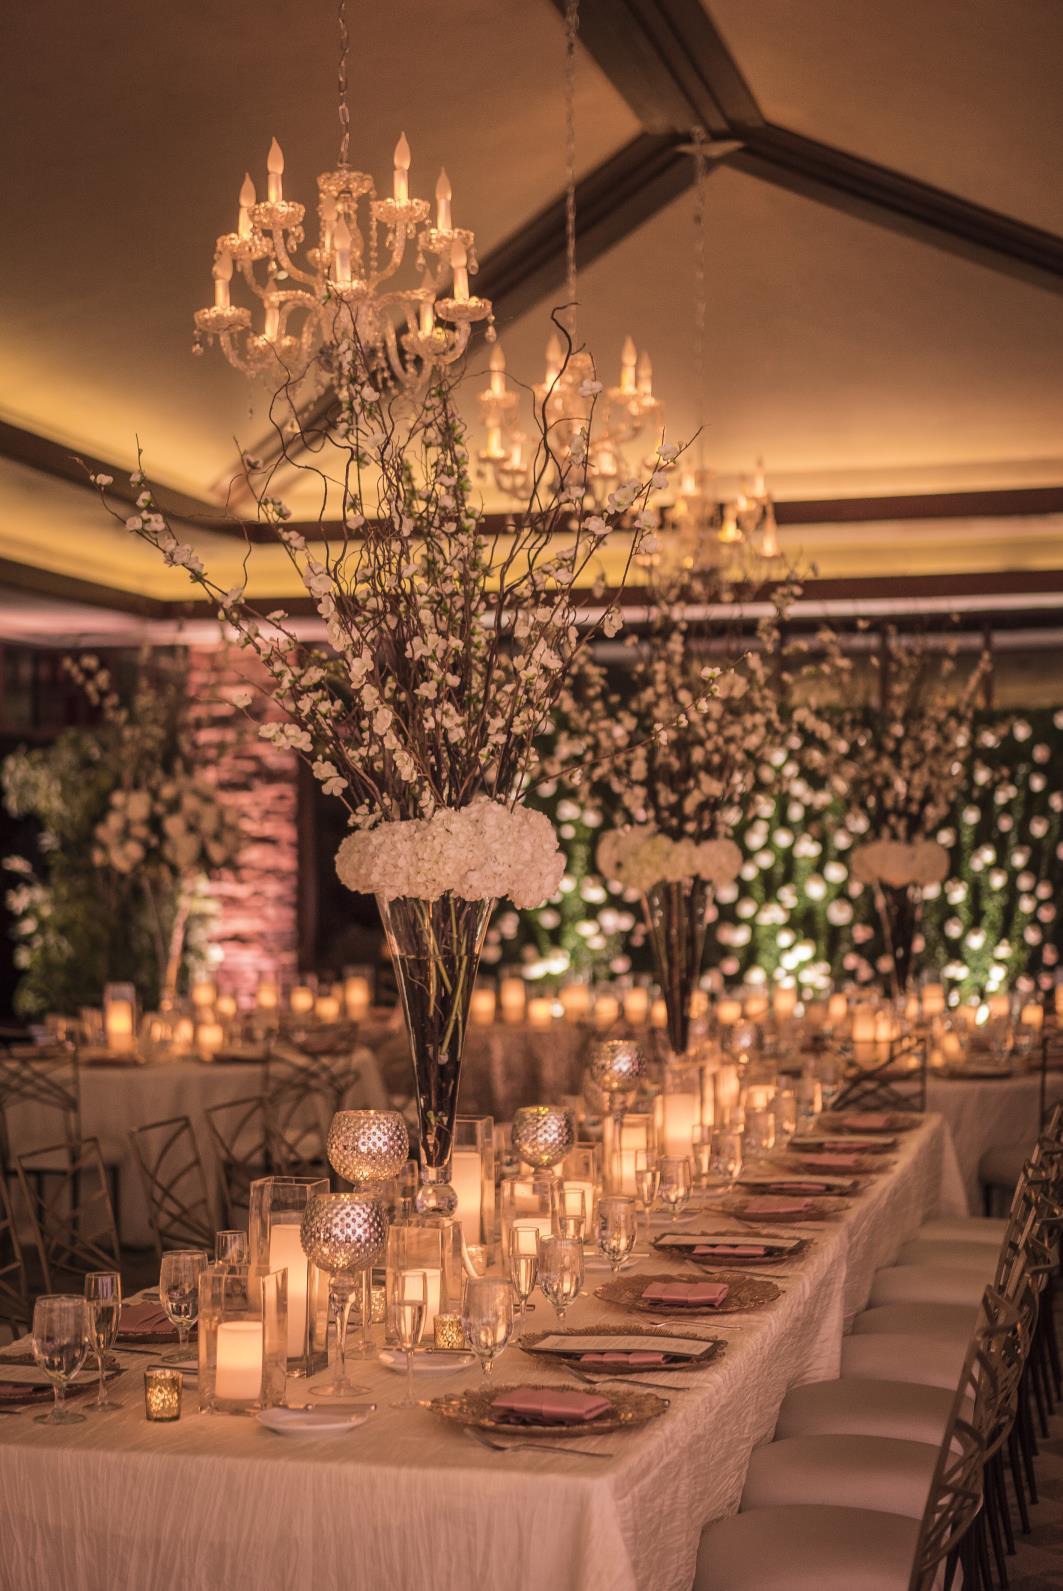 Wedding planning planners in las vegas chelsie alexbrella gagiano photographybrandrea eppolito weddings junglespirit Image collections